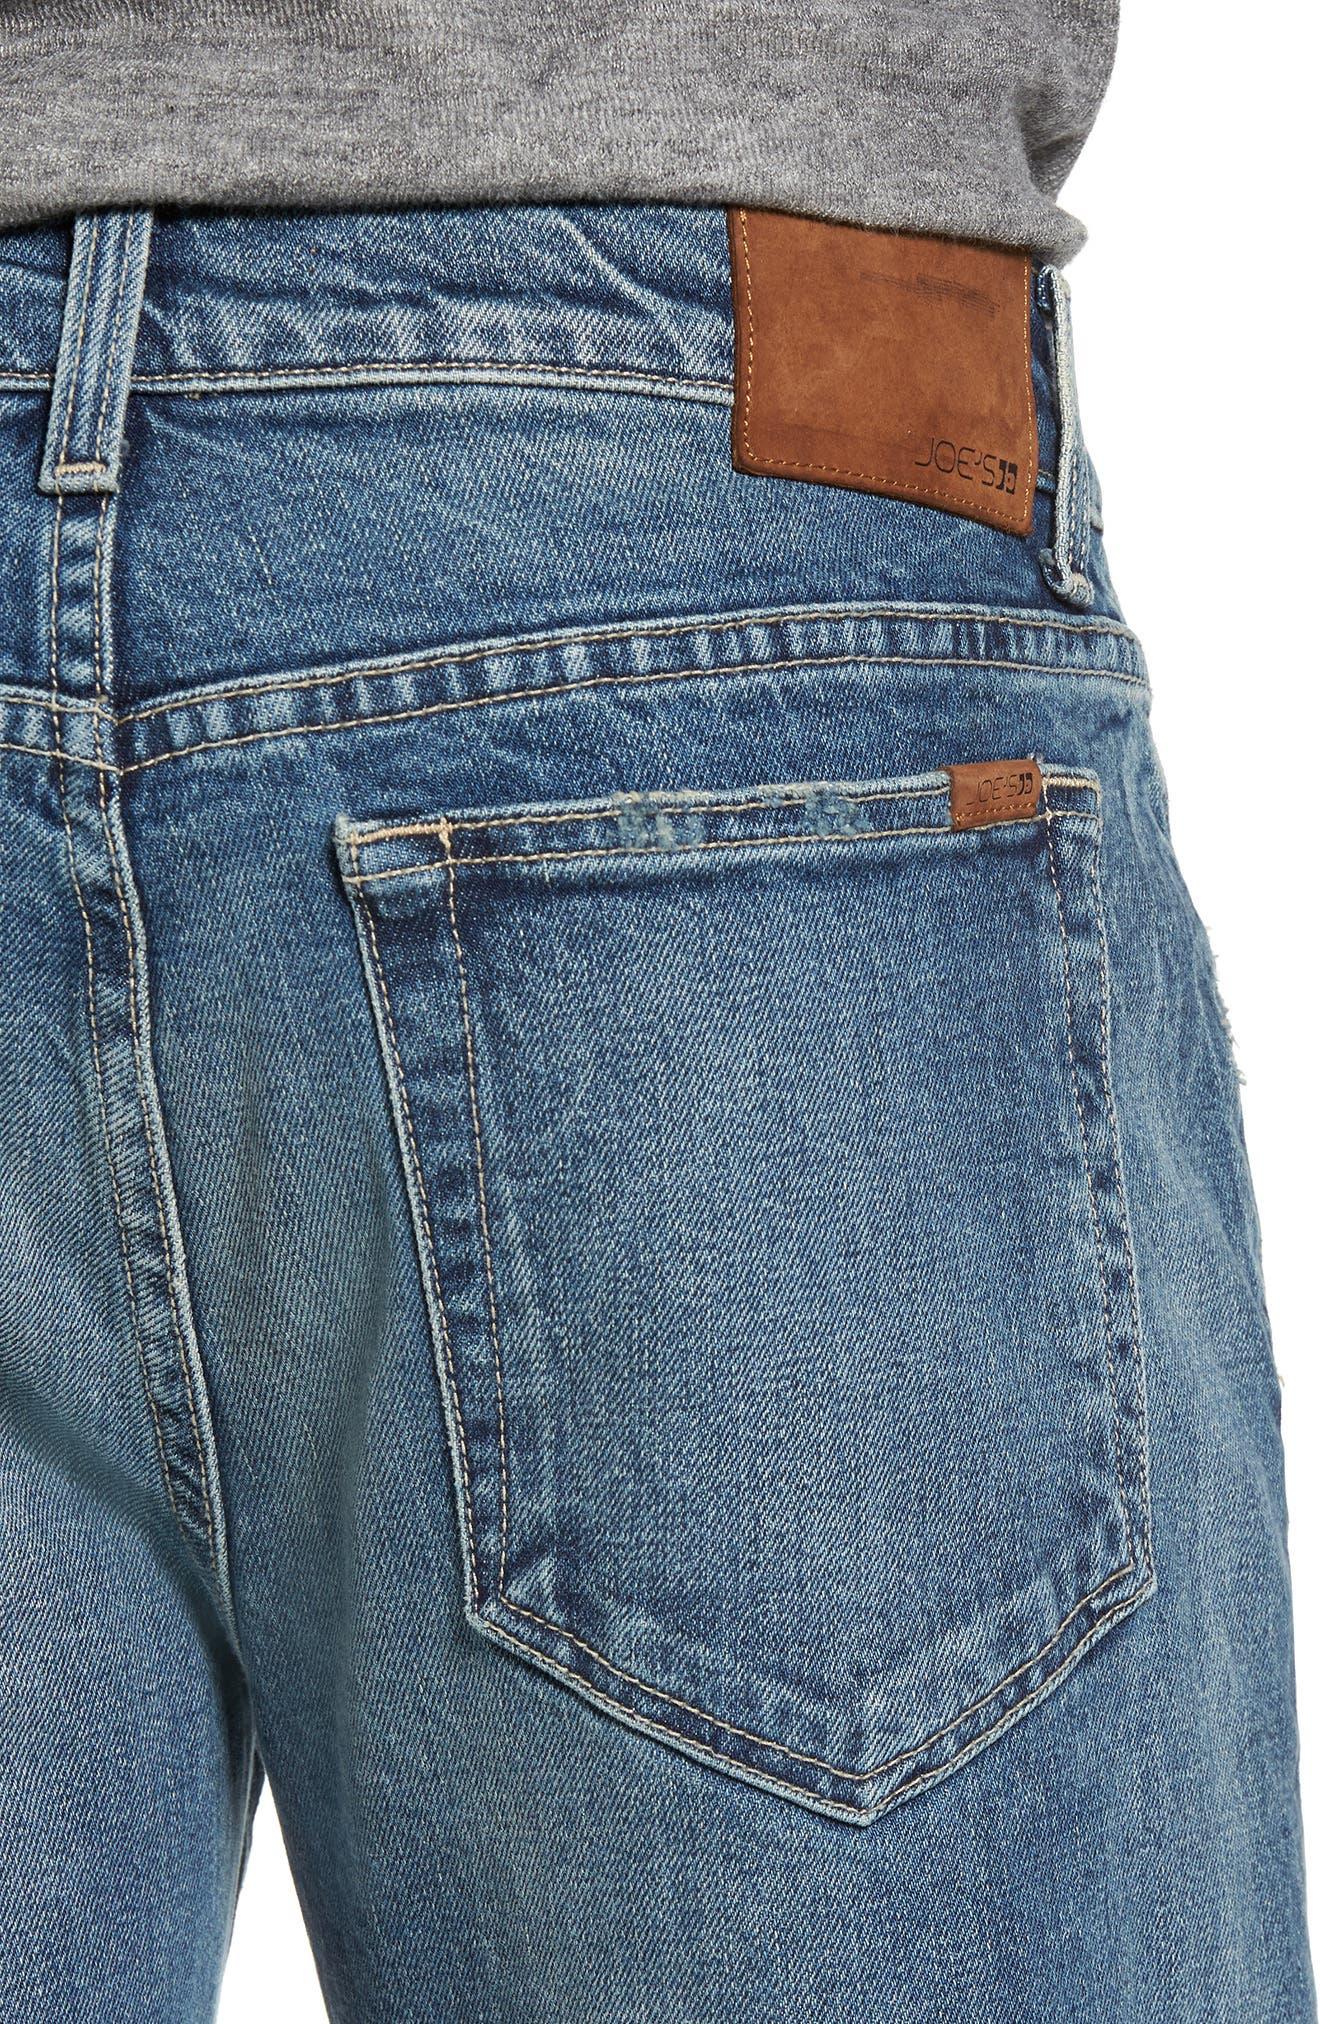 Slim Fit Jeans,                             Alternate thumbnail 4, color,                             Olson